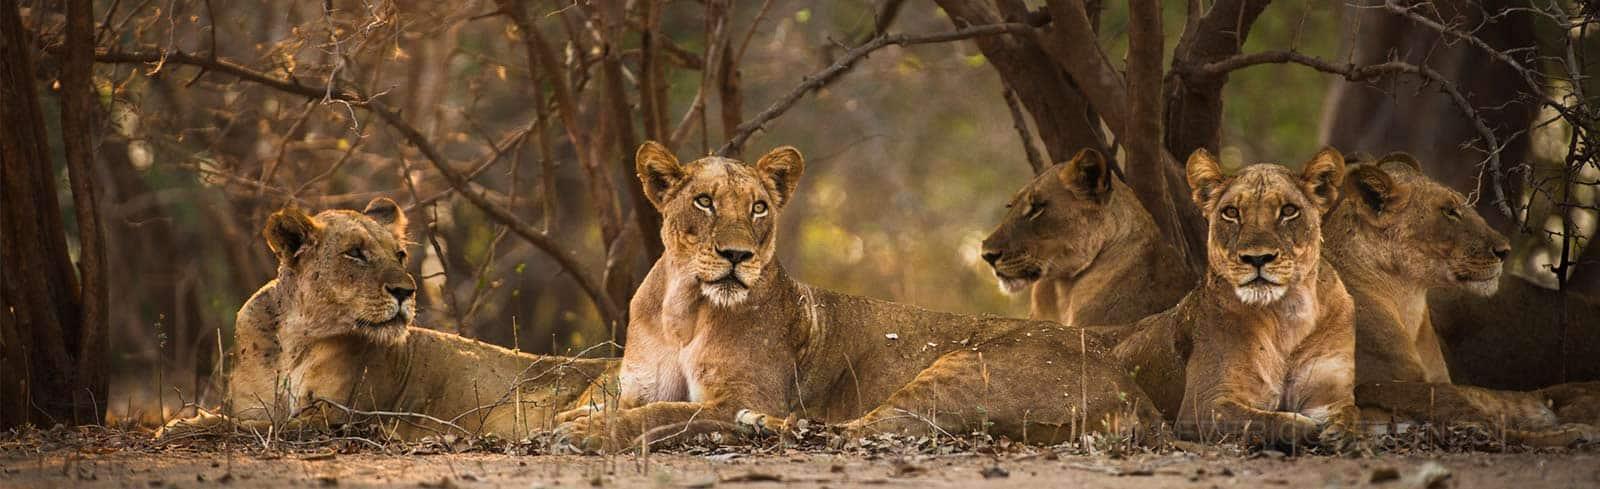 Lions Mana Pools National Park - Federico Veronesi